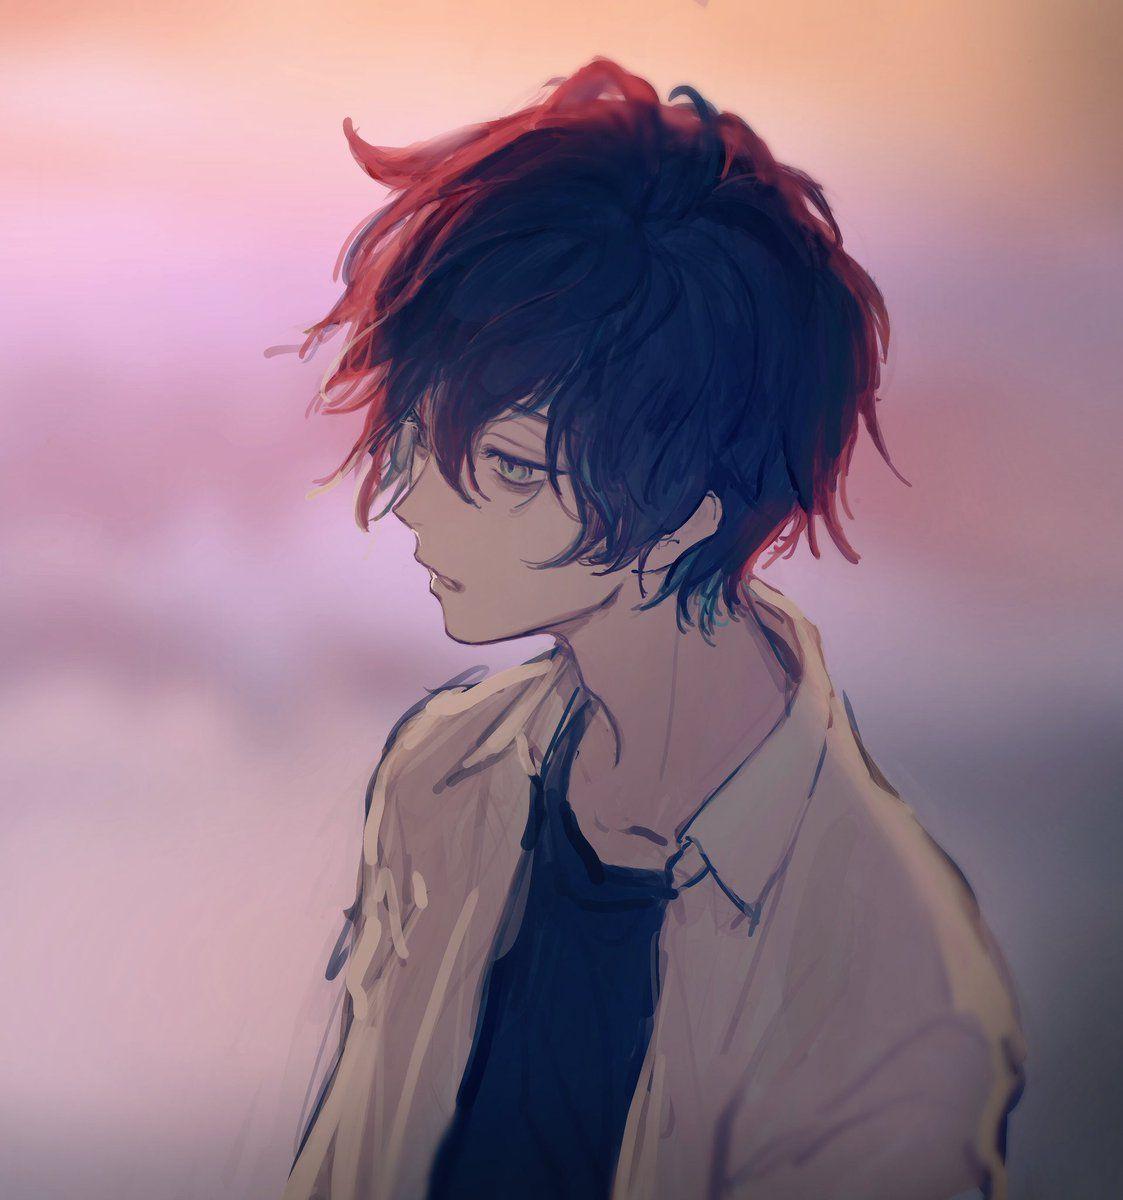 Kawaii Anime Pfp Boy Novocom Top